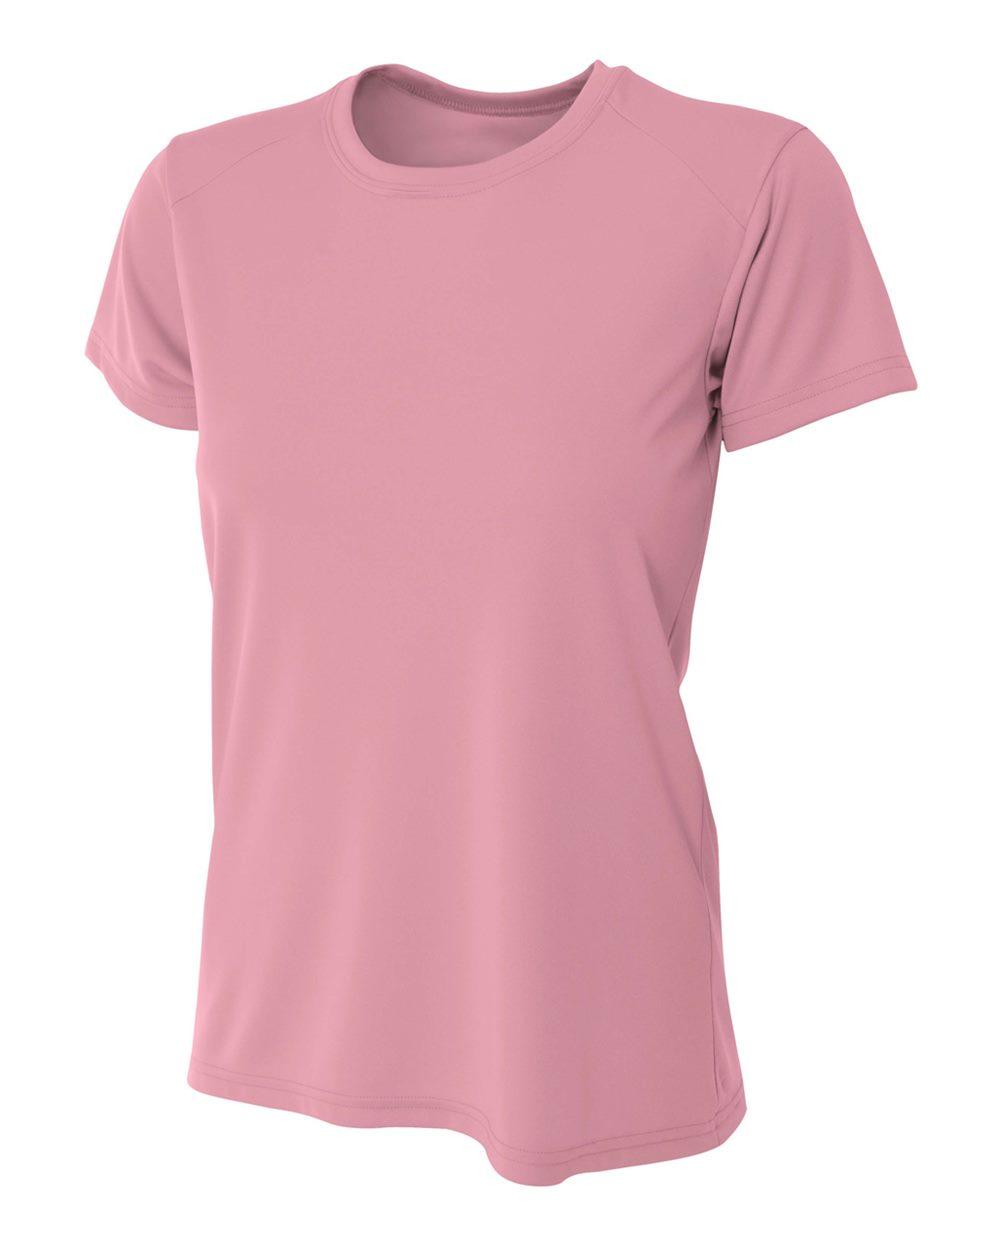 womens-polo-mwicking-pink.jpg